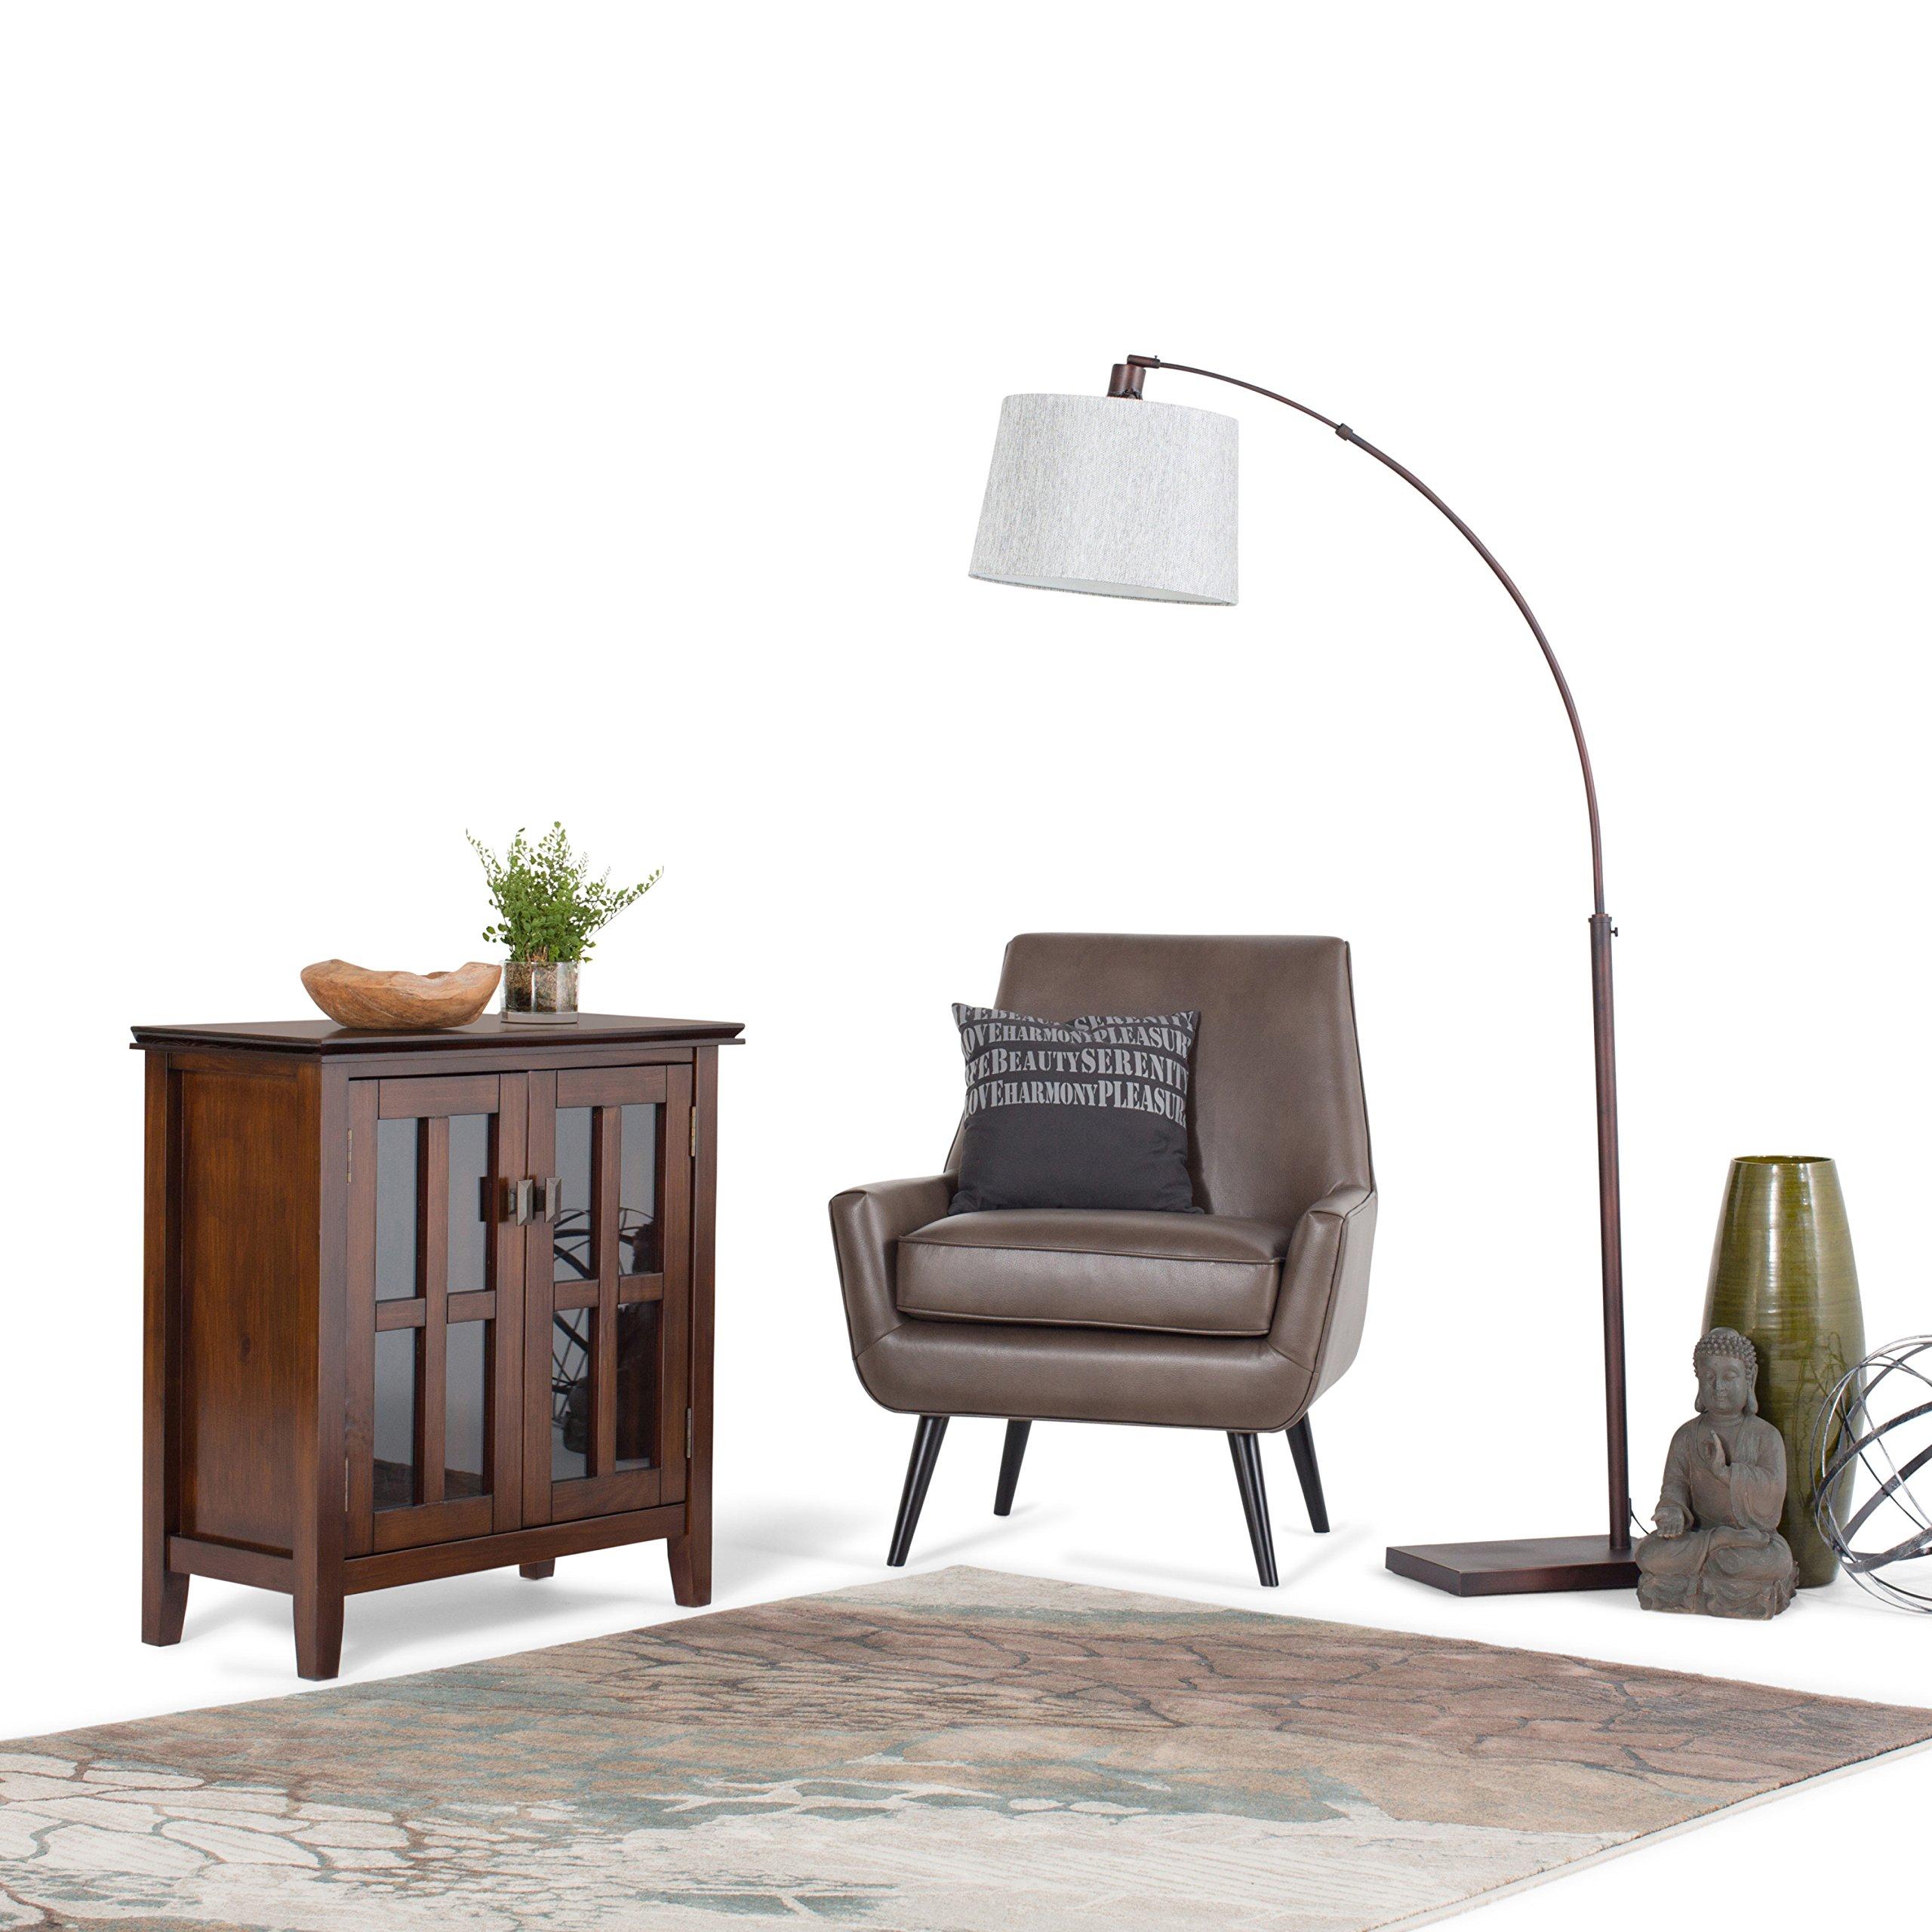 Simpli Home Artisan Solid Wood Low Storage Cabinet, Medium Auburn Brown by Simpli Home (Image #2)